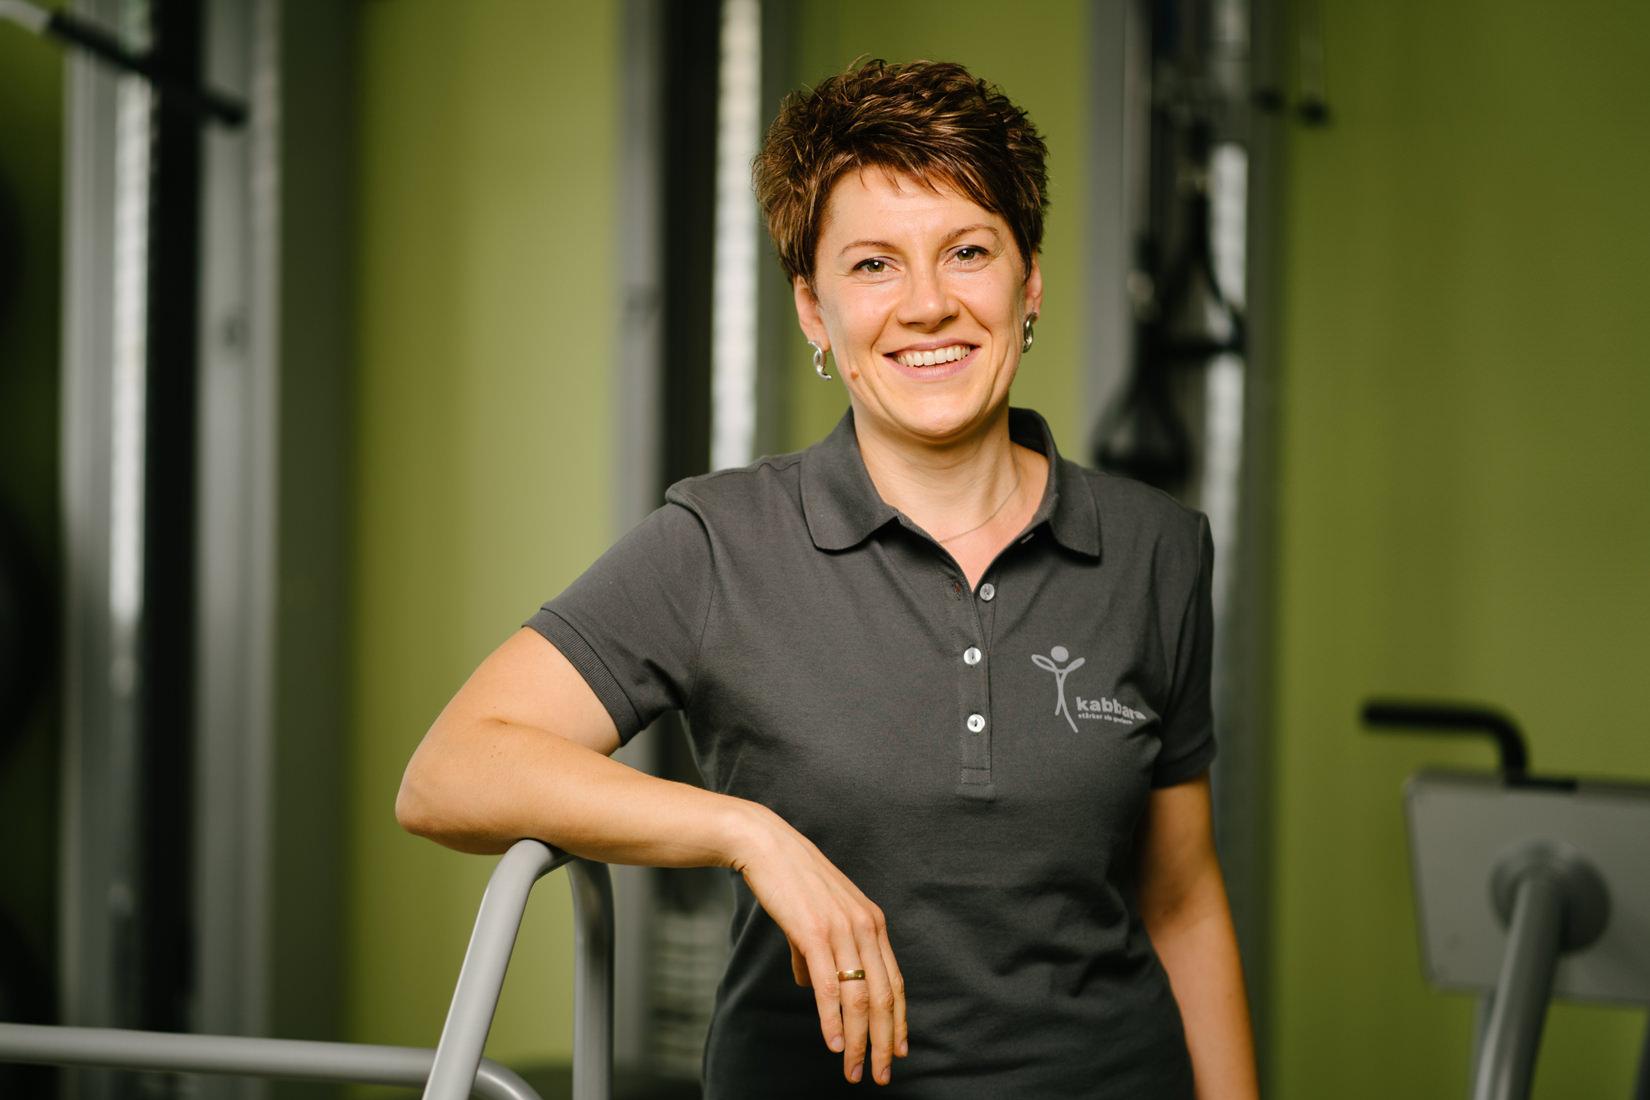 Physiotherapie Schorndorf - Klaudia Dressler - Team